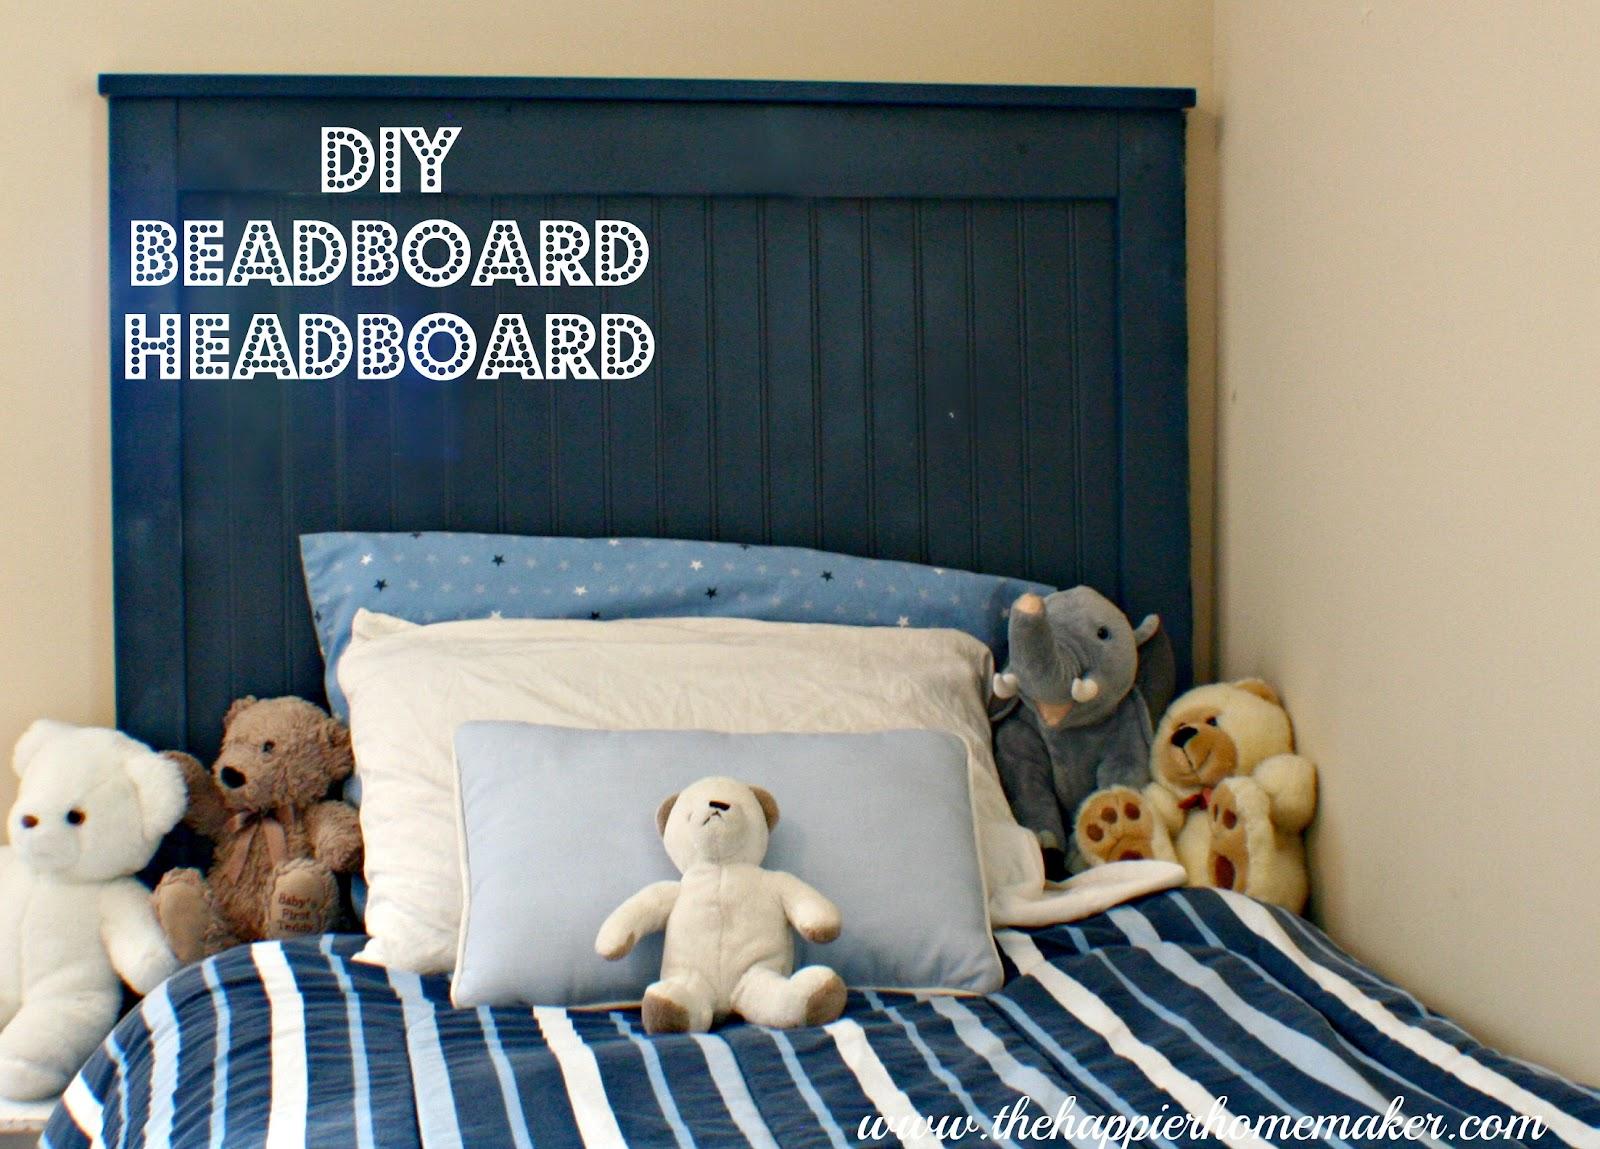 Diy beadboard headboard the happier homemaker for Make a headboard diy